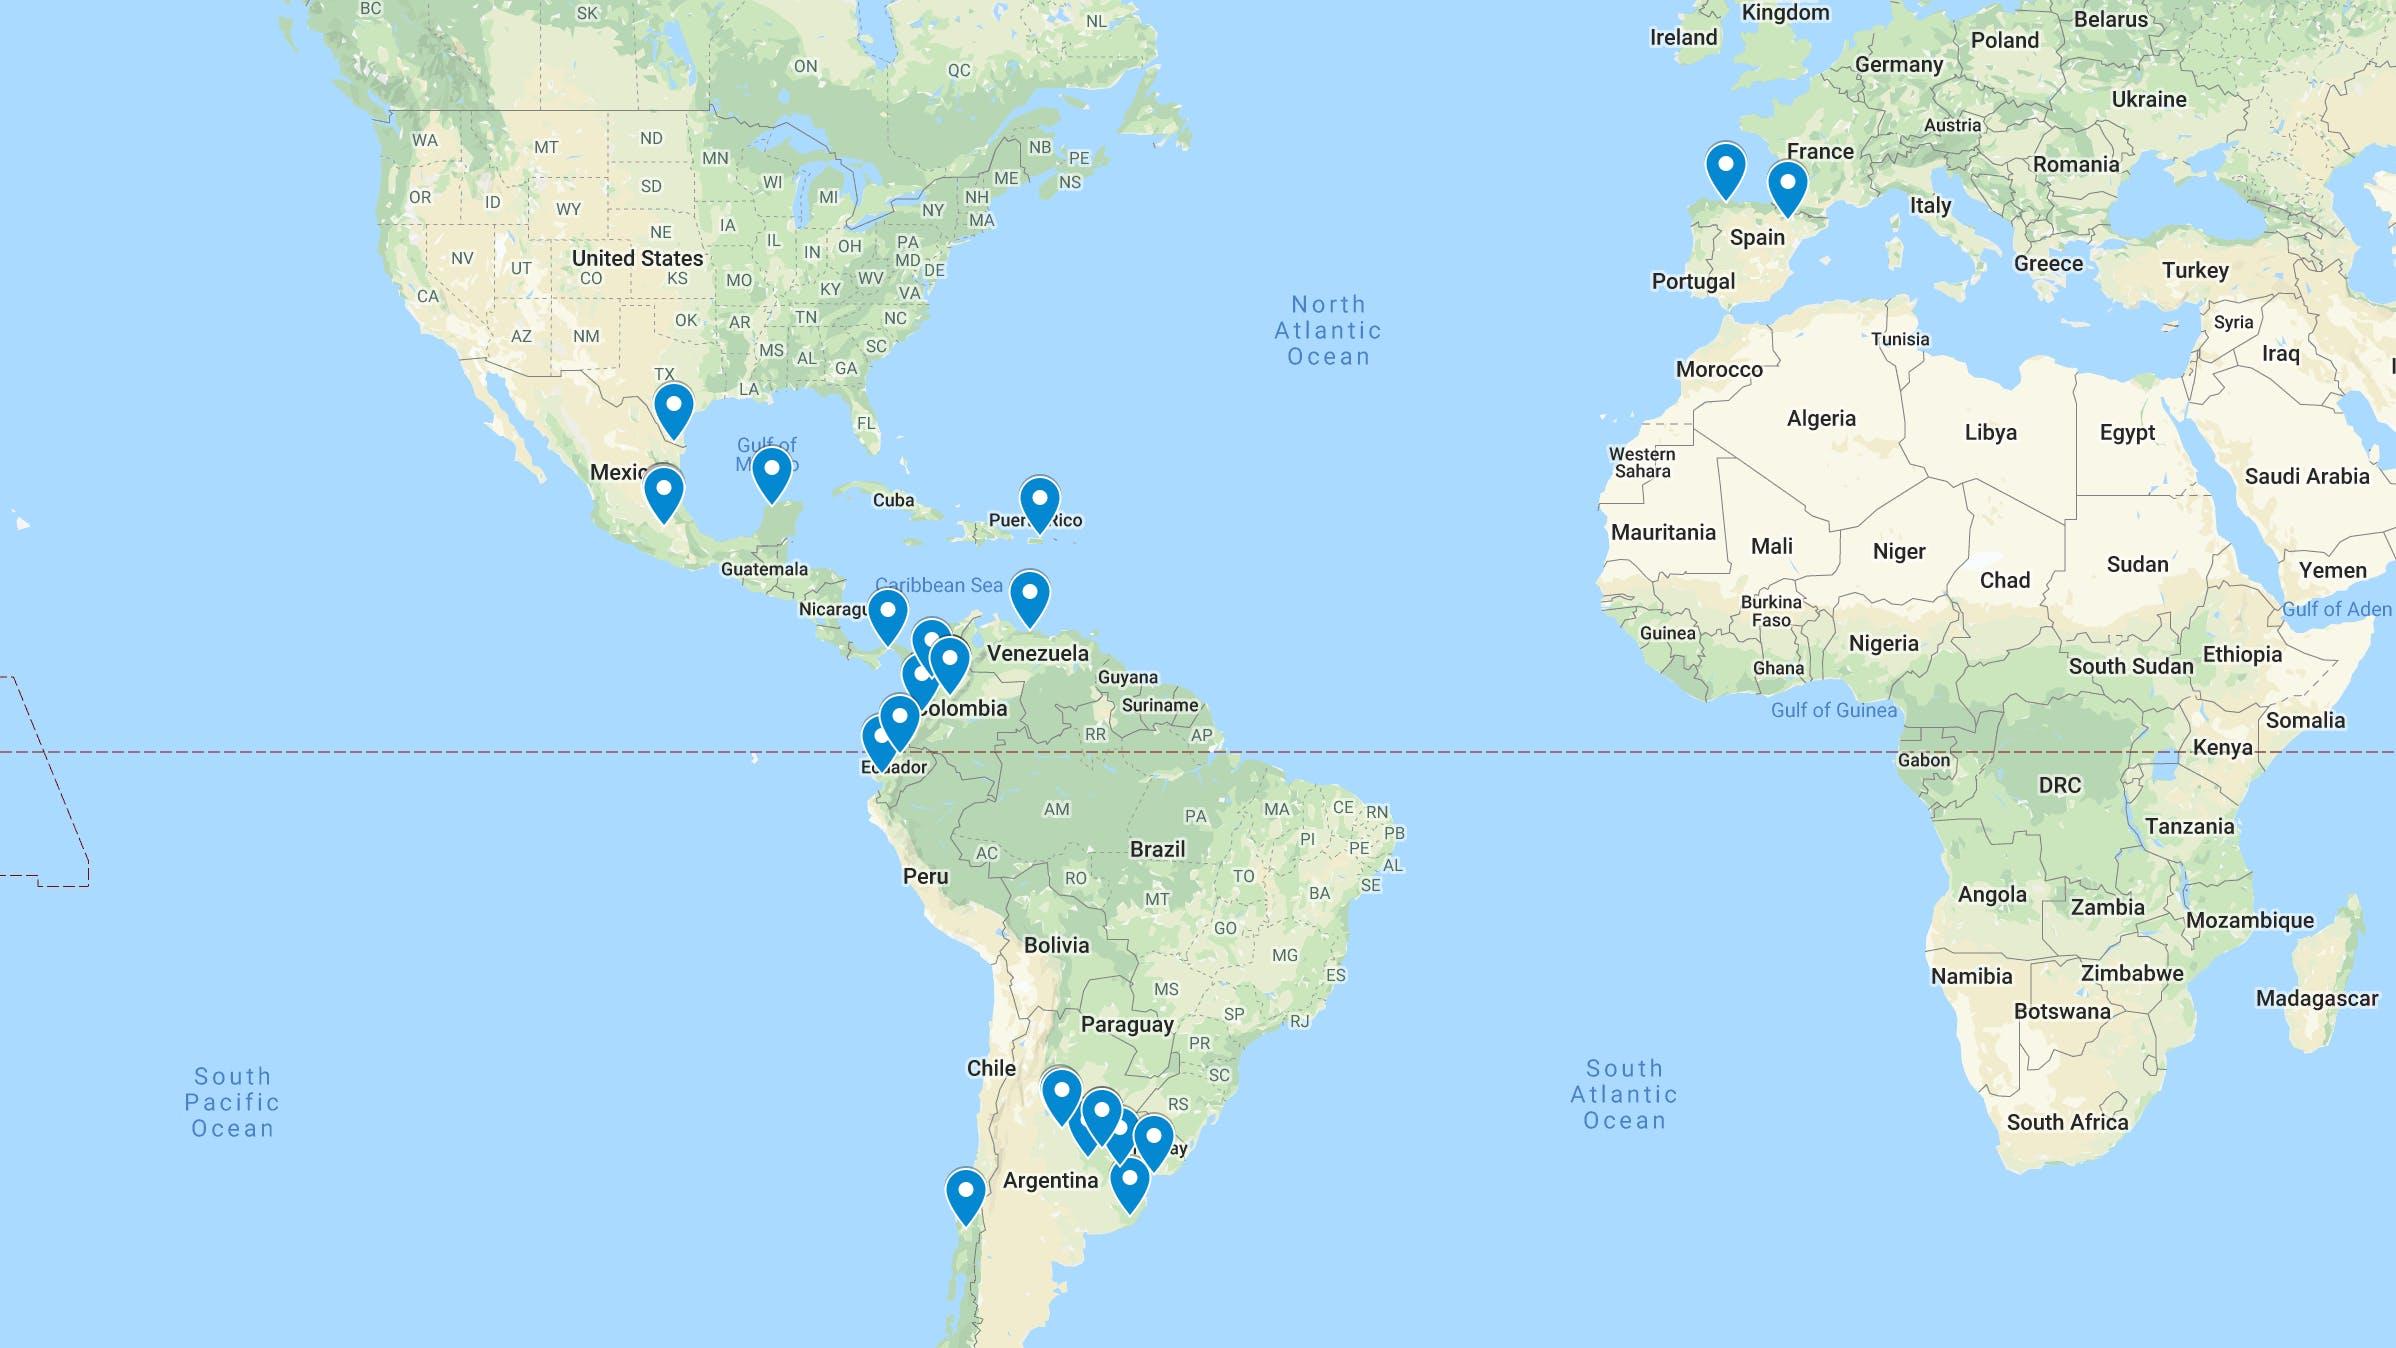 películas de atlas 2020 de diabetes mundial